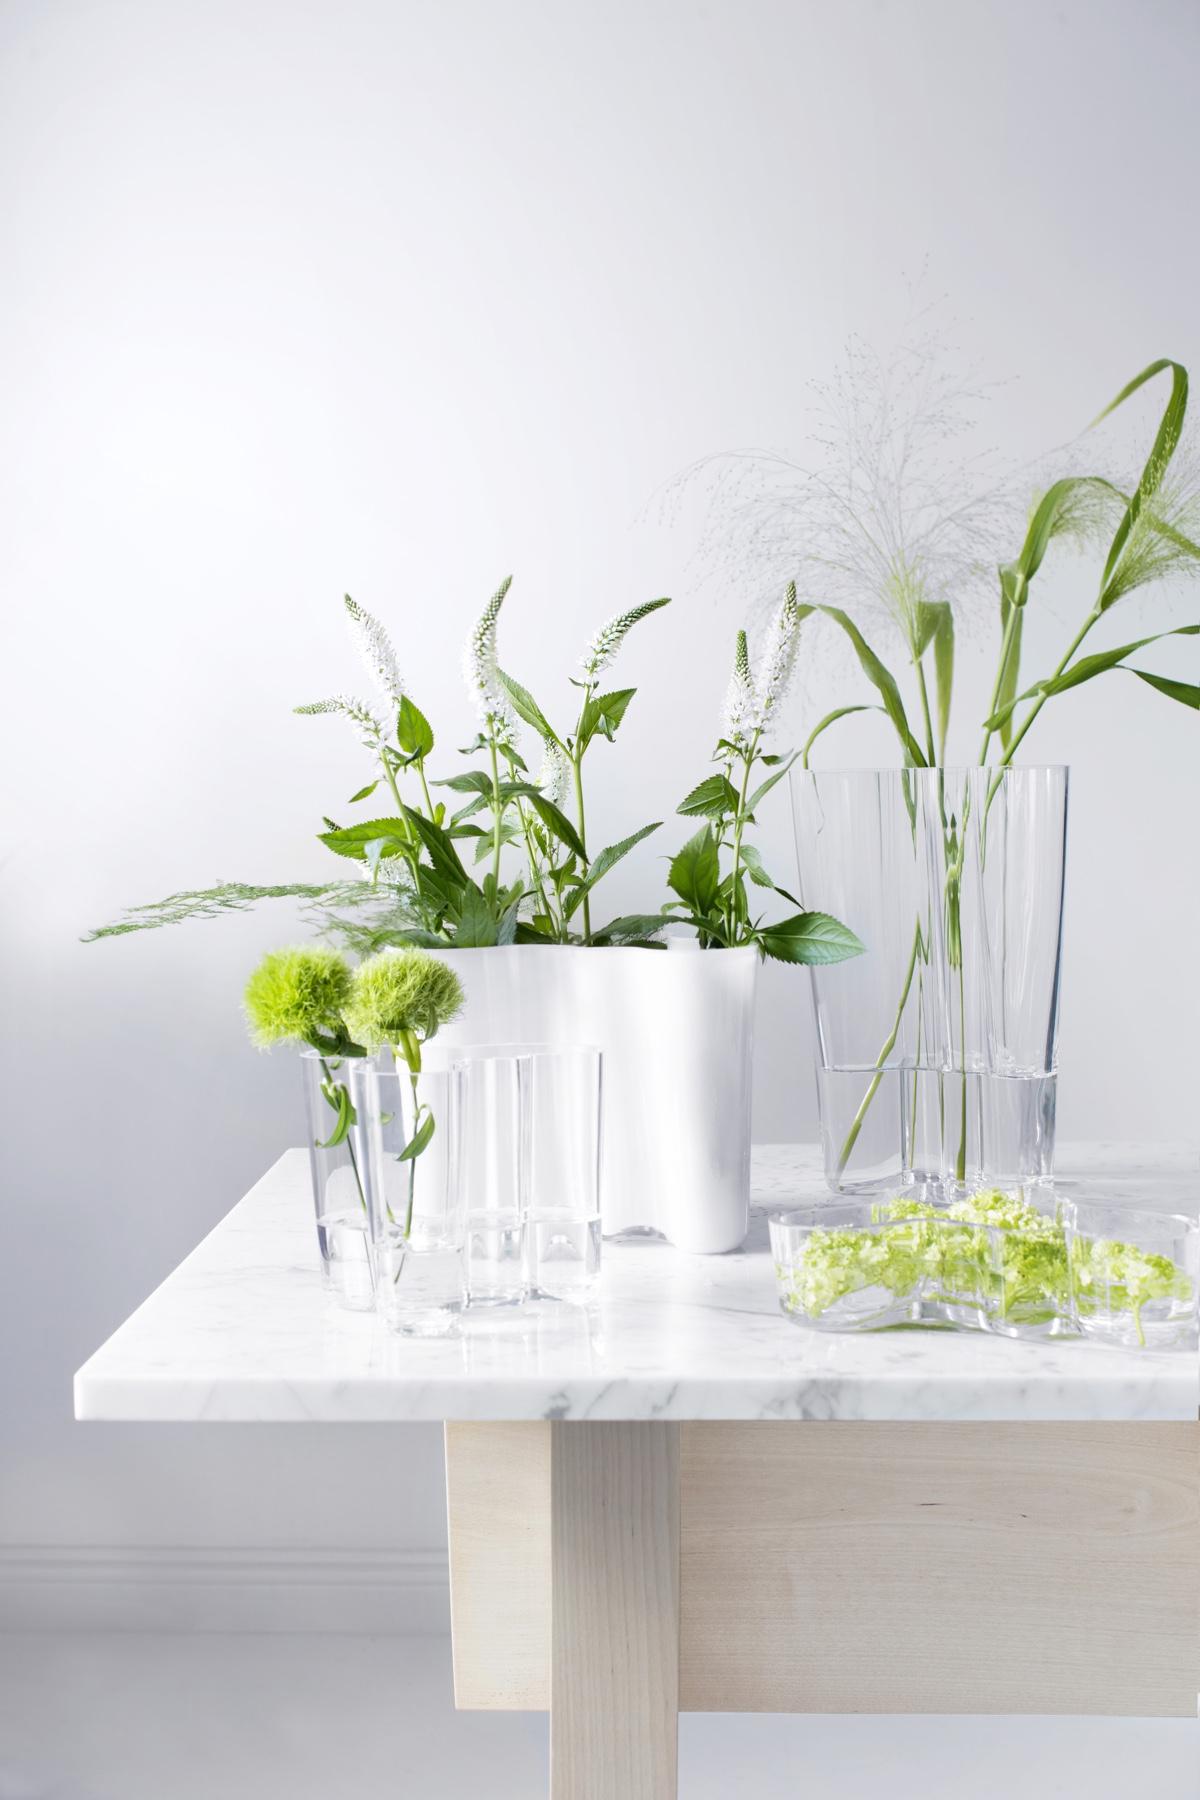 Alvar Aalto collection. Photoby Kristiina Kurronen and styling by Susanna Vento.